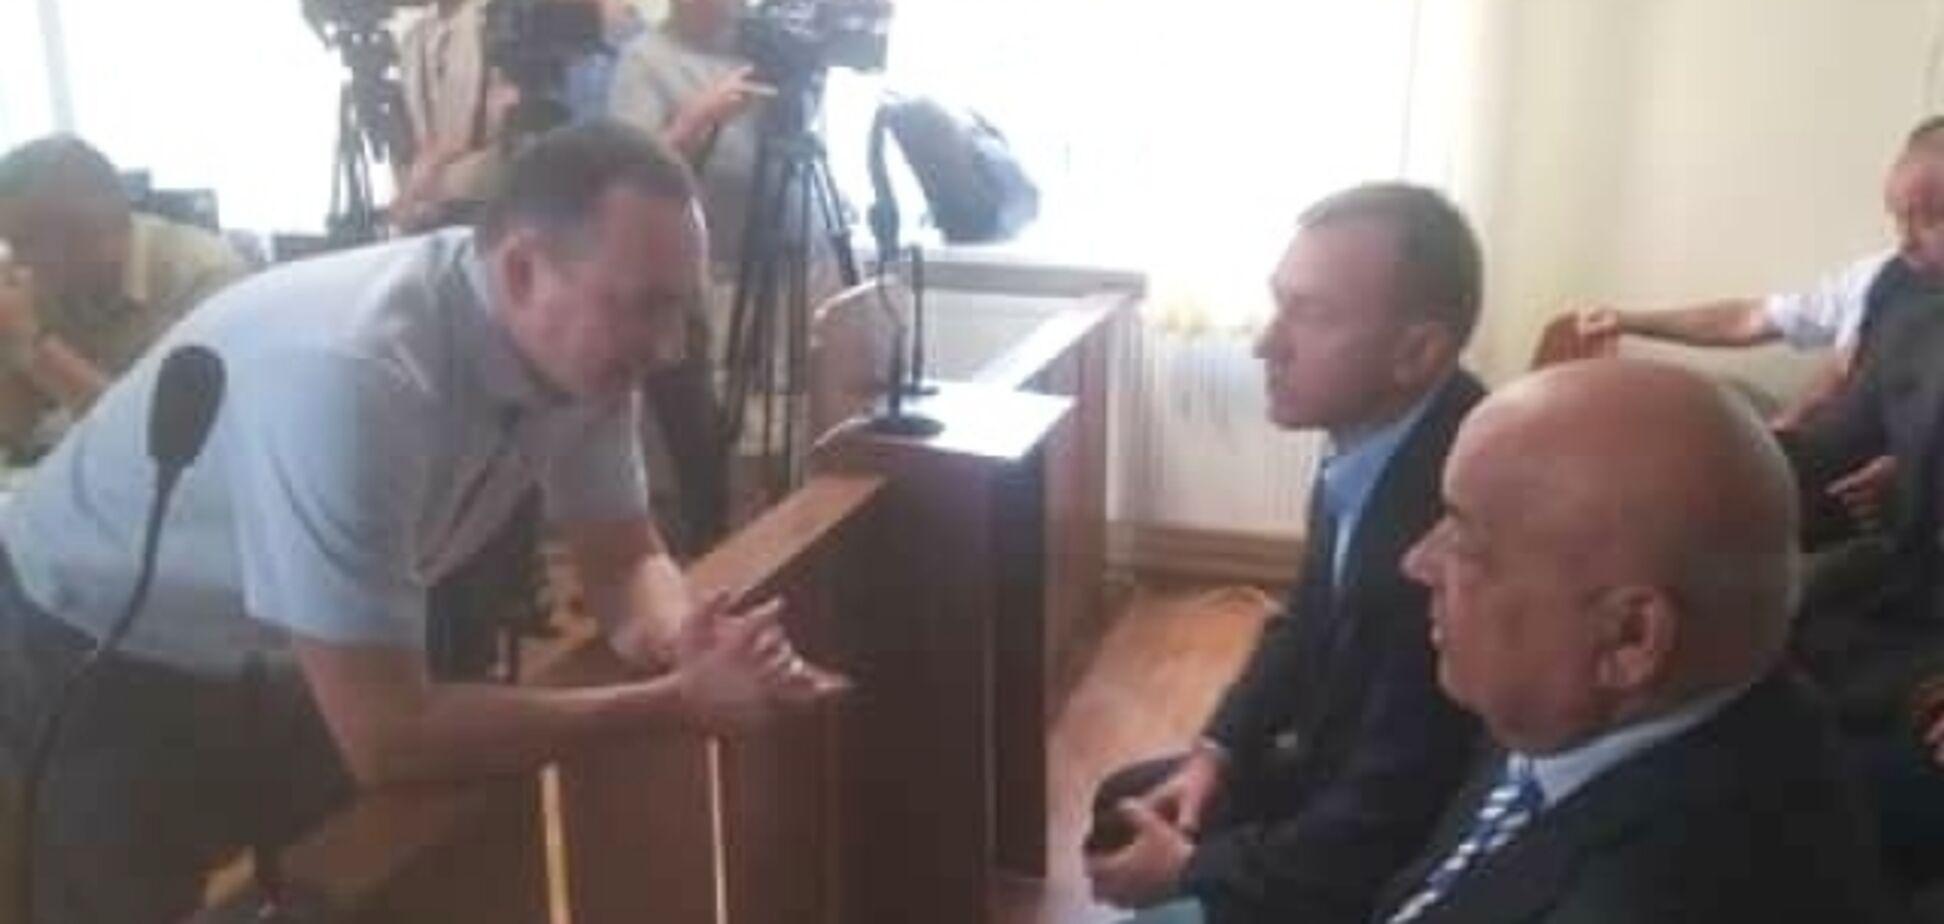 Дело на 6,5 млн: арестован мэр Ужгорода